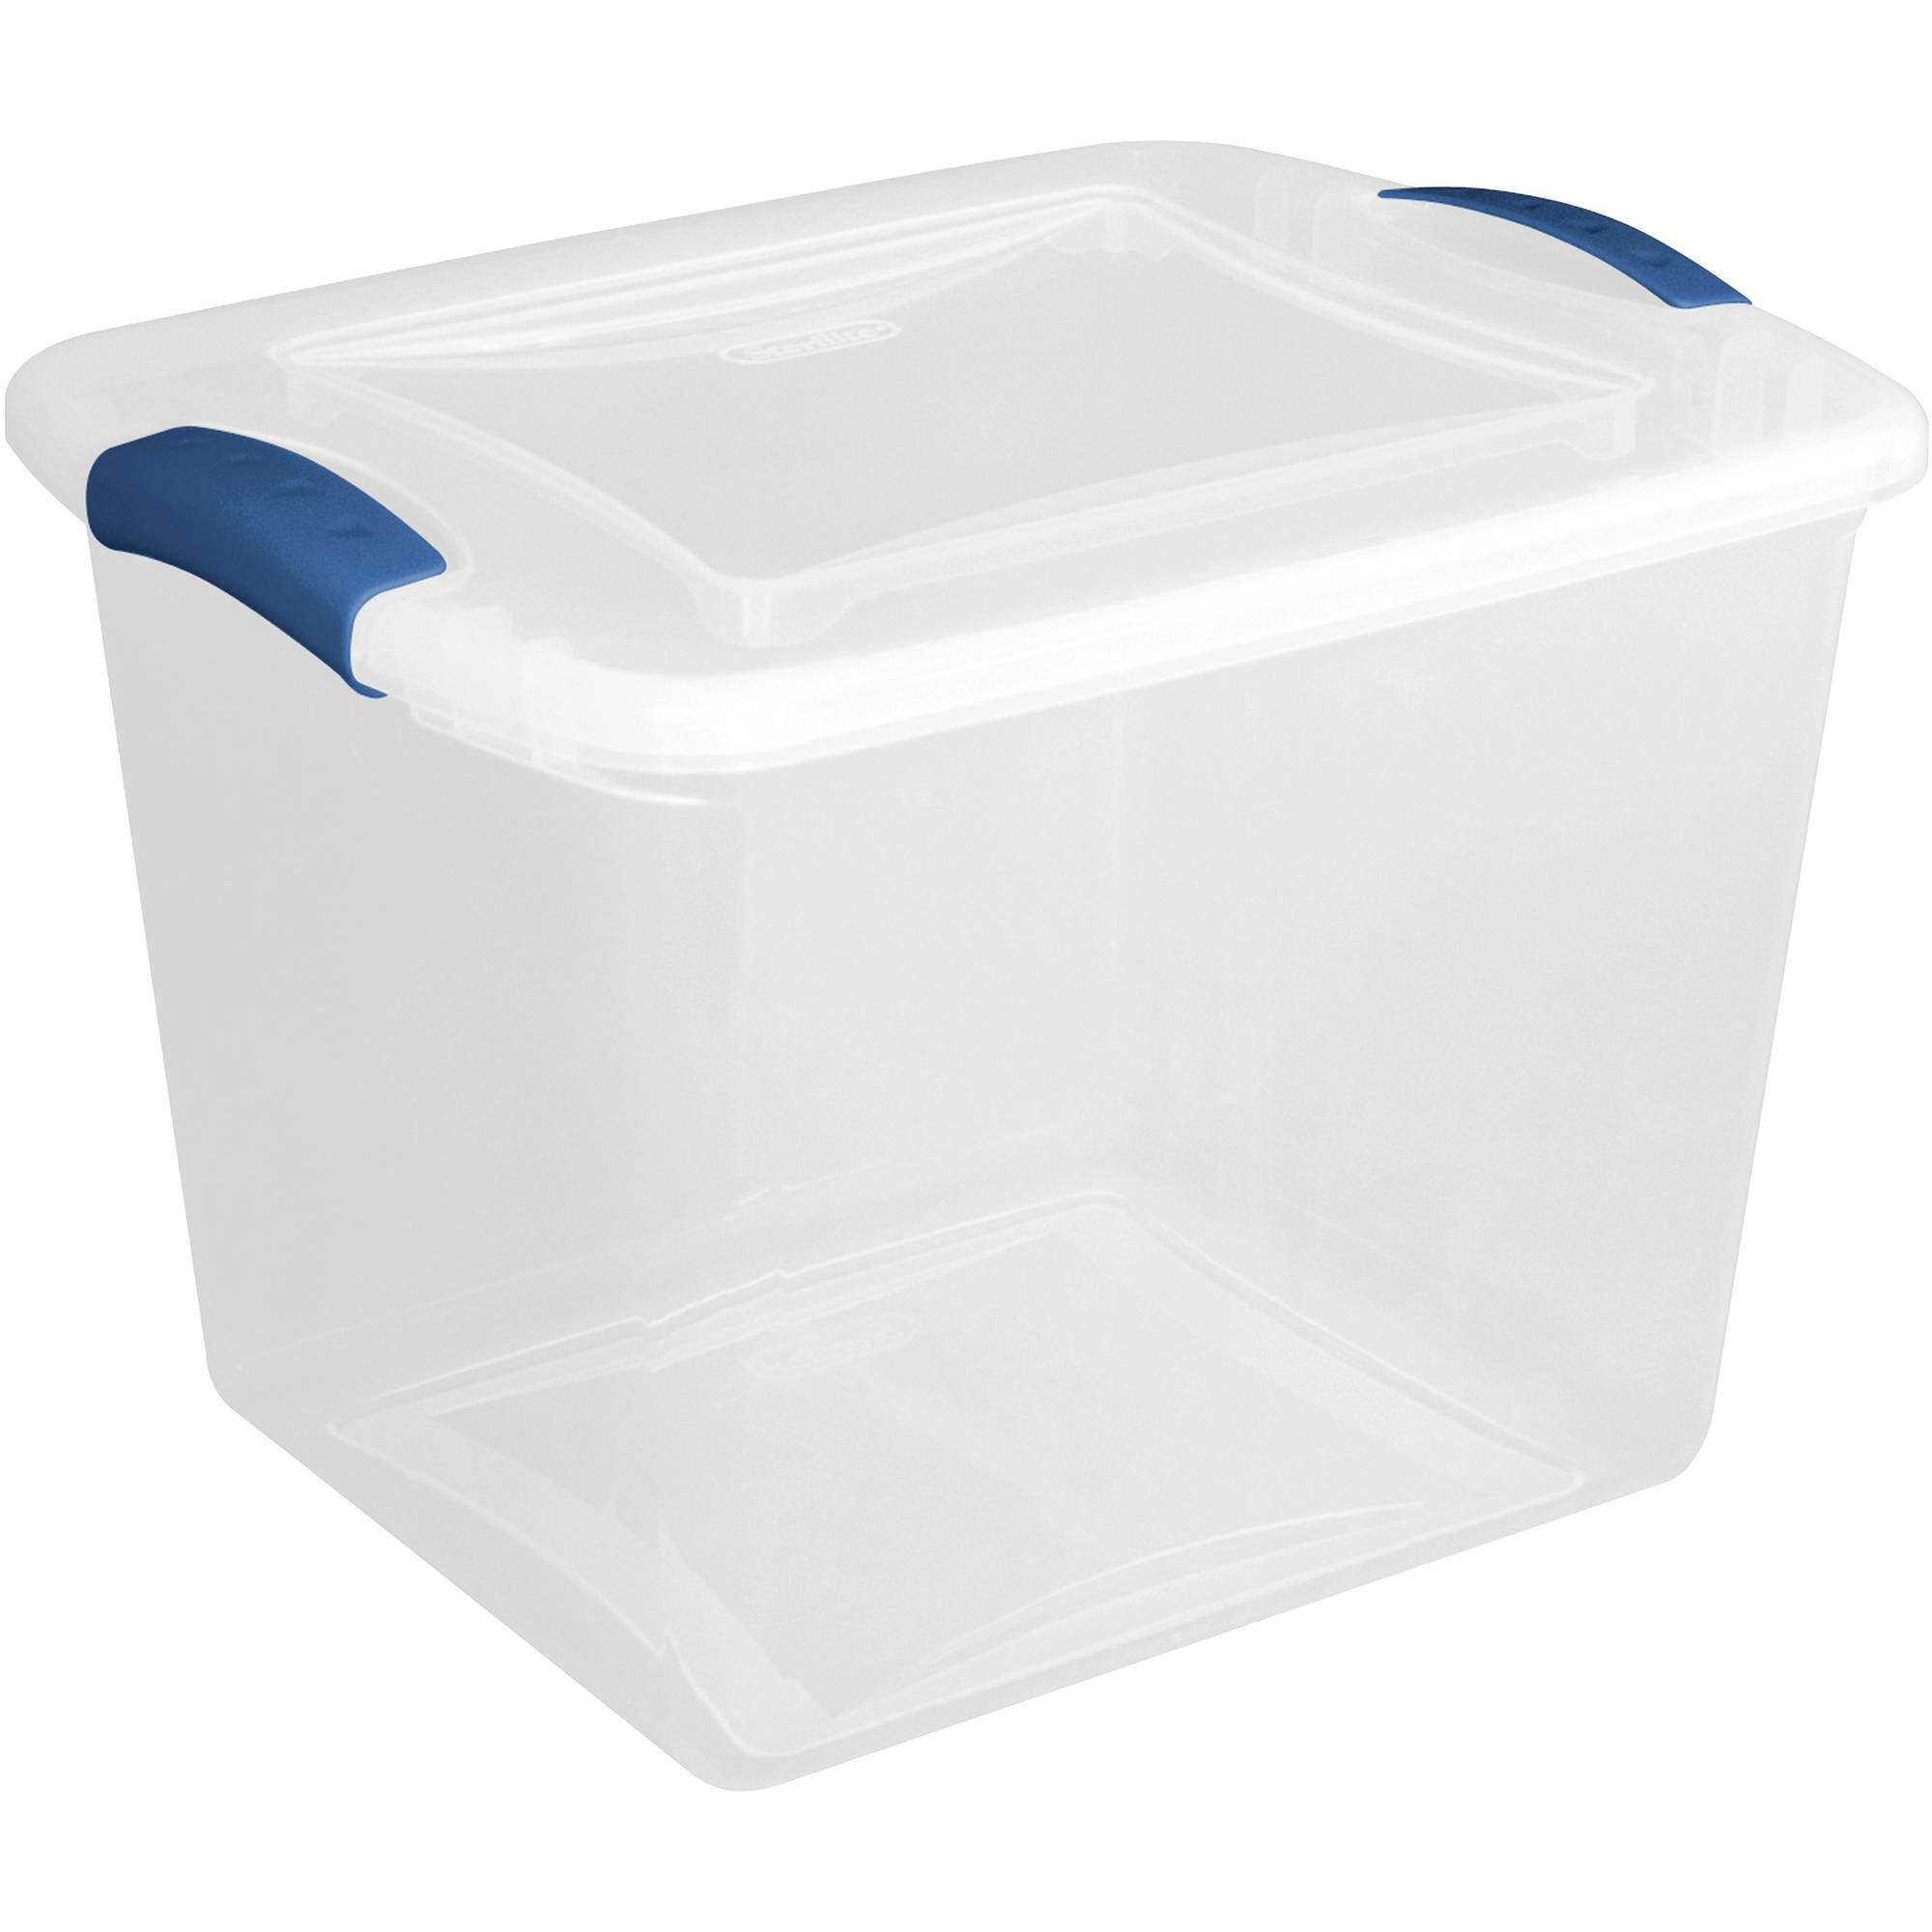 Sterilite 27 Quart Latch Box- Blue Eclipse, Set of 10